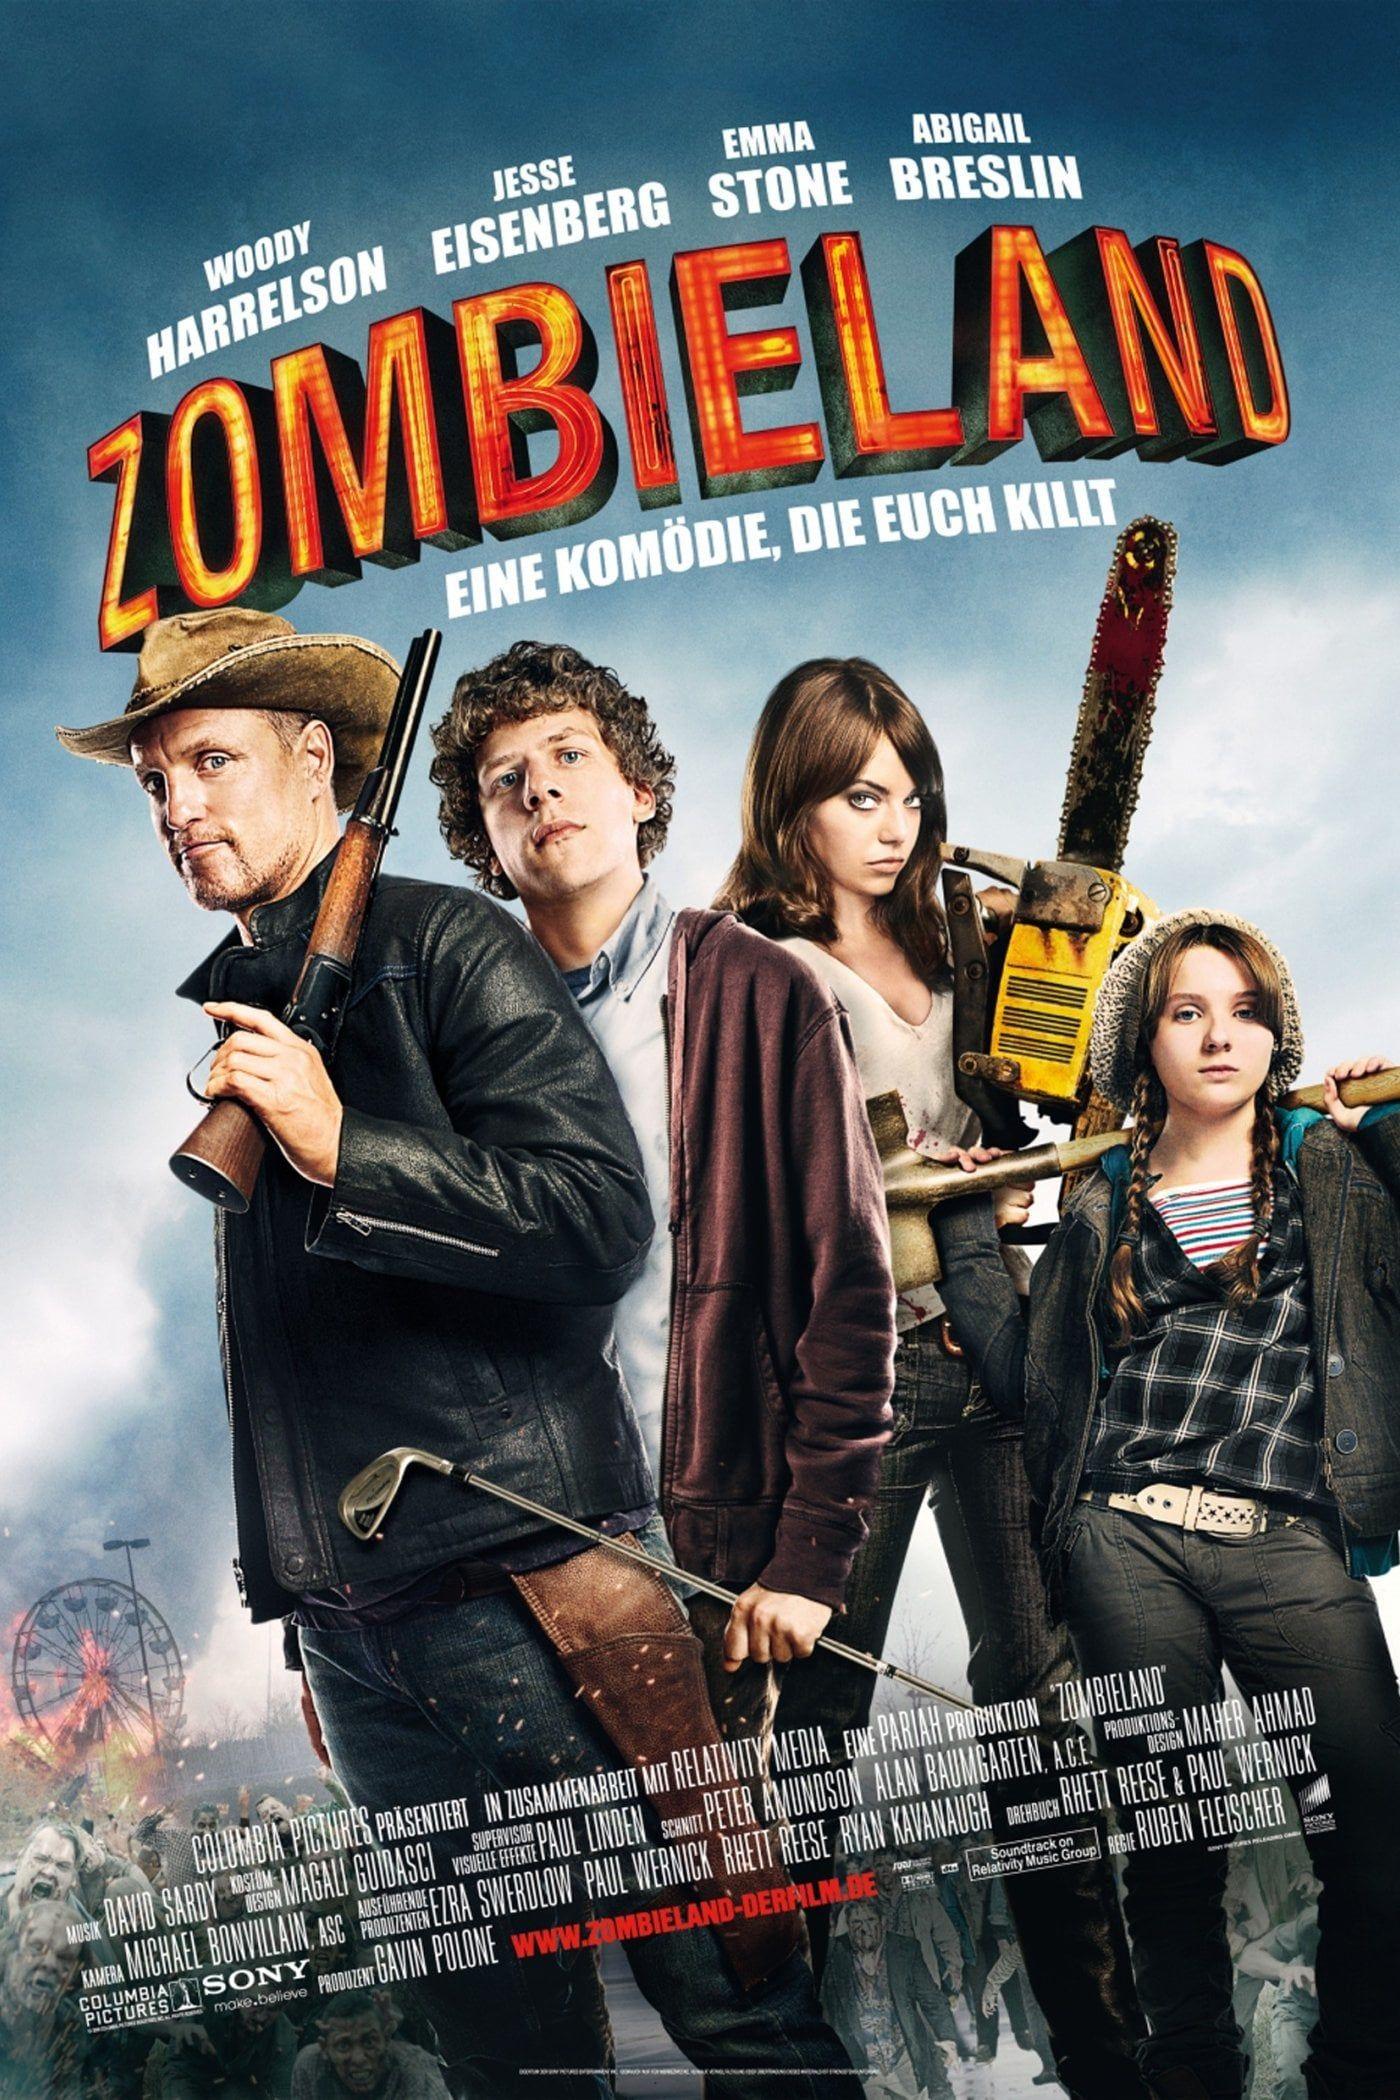 Zombieland Streaming Vf Complet En Ligne Gratuite Streaming Vf Best Horror Movies List Zombieland Movie Horror Movies List